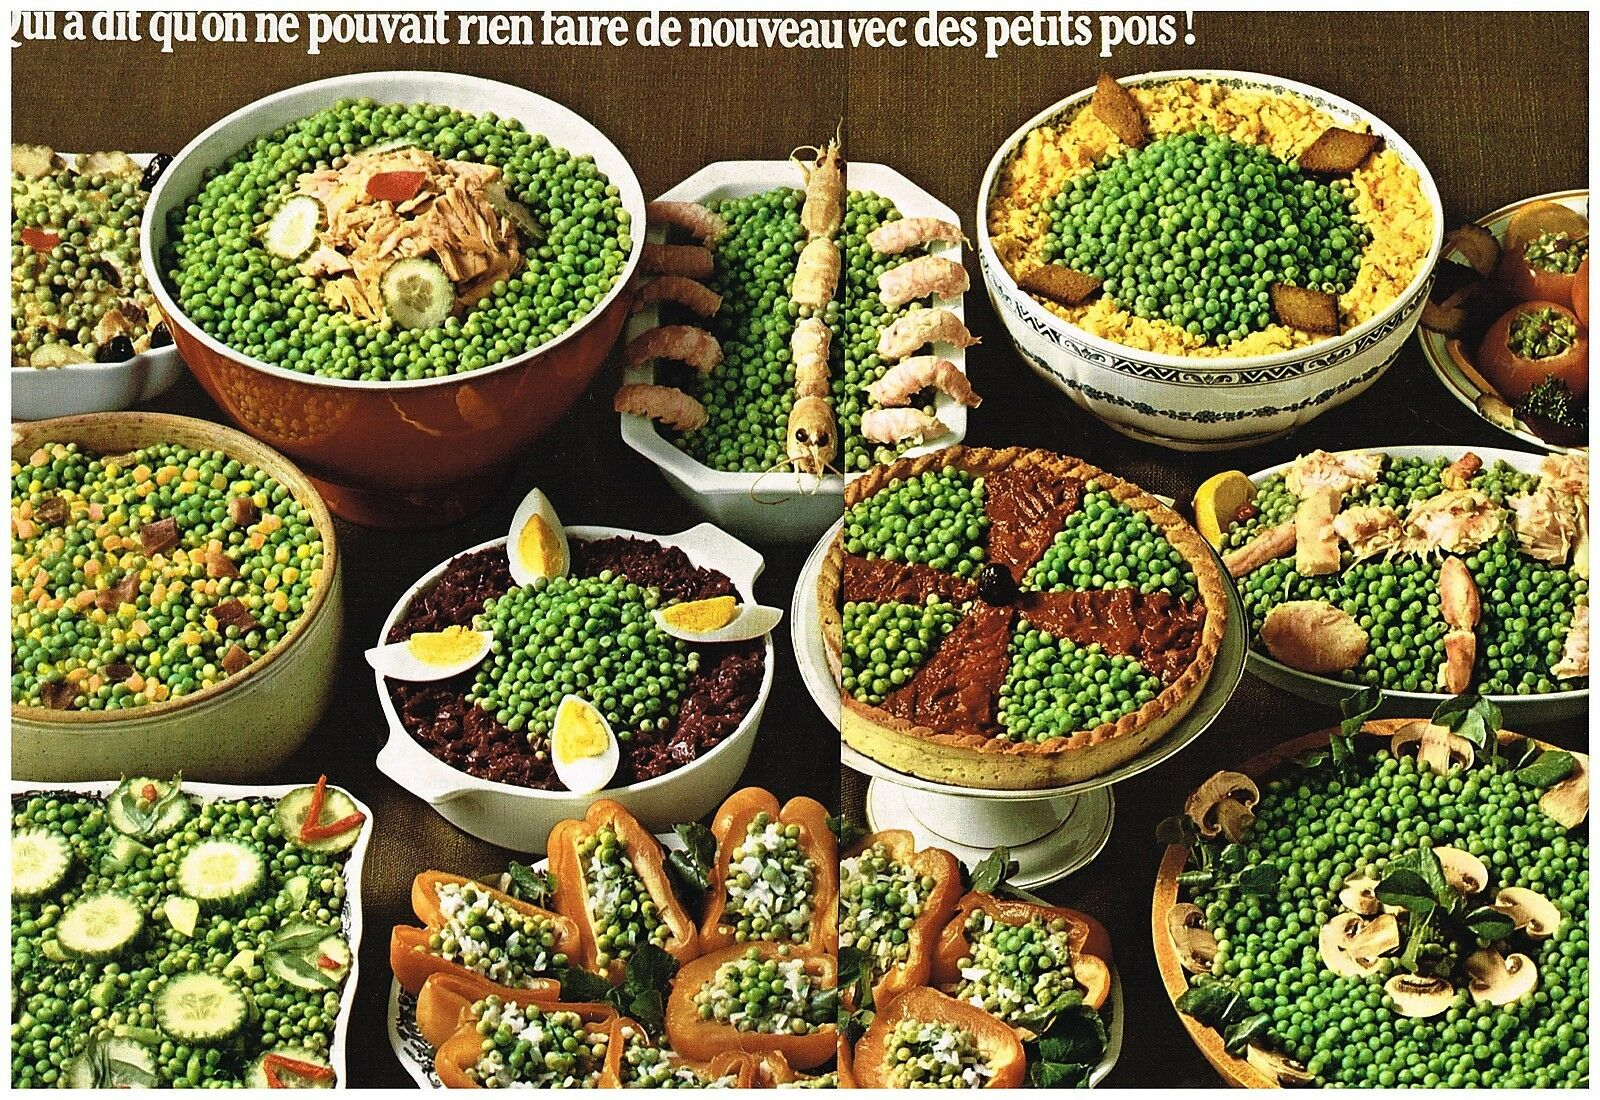 Les Petits Pois 1970